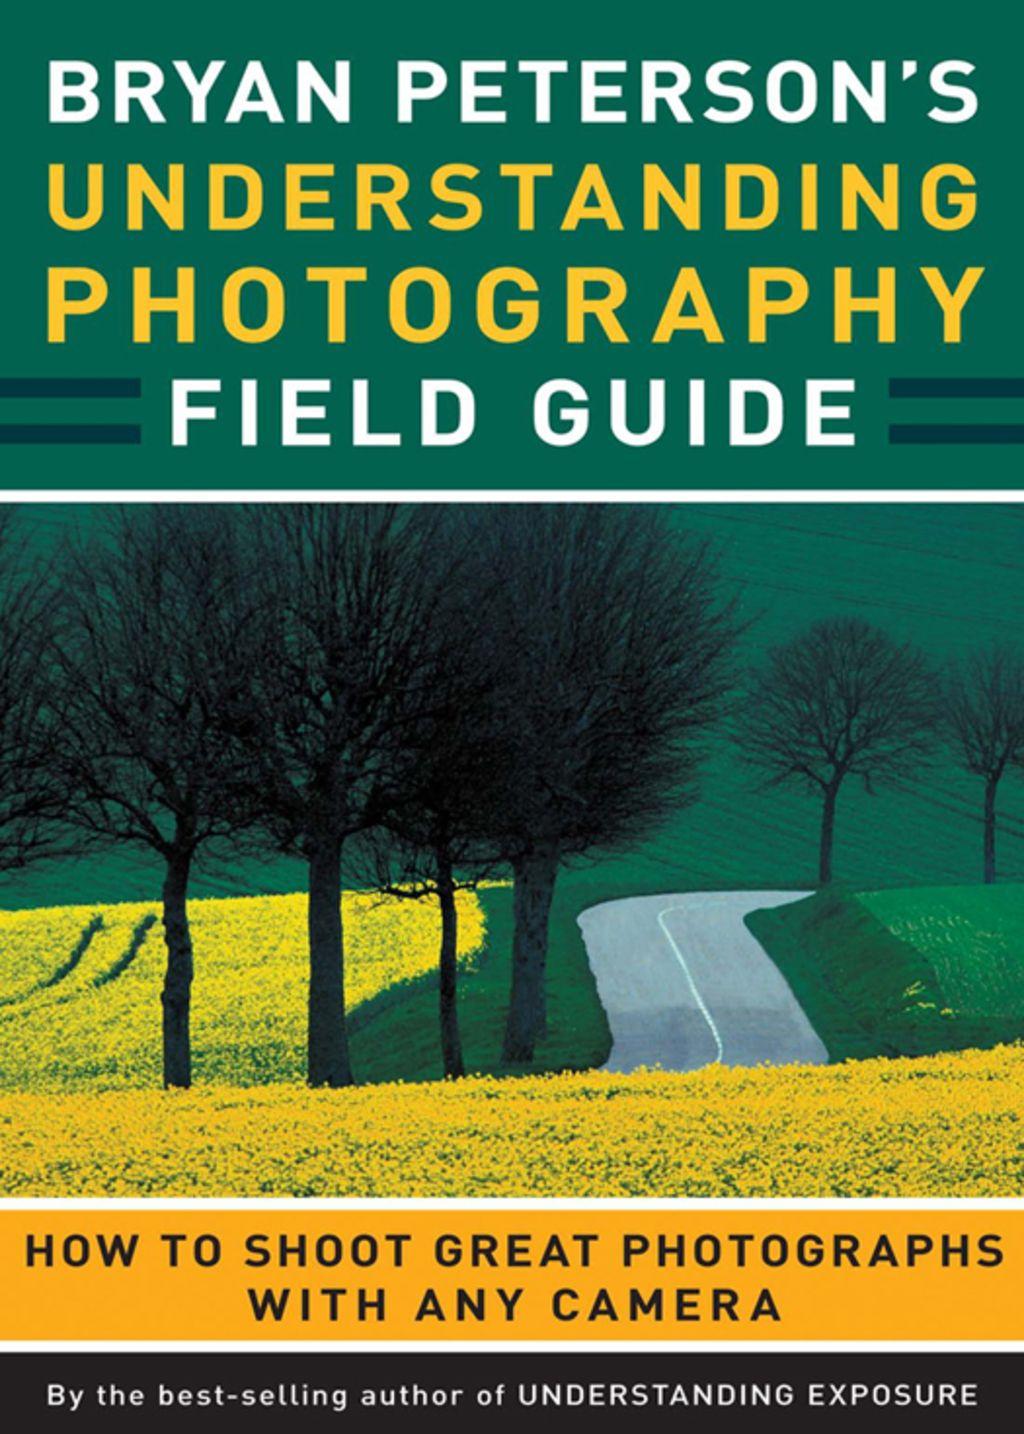 Bryan Peterson S Understanding Photography Field Guide Ebook Field Guide Bryan Peterson Photography Ebooks